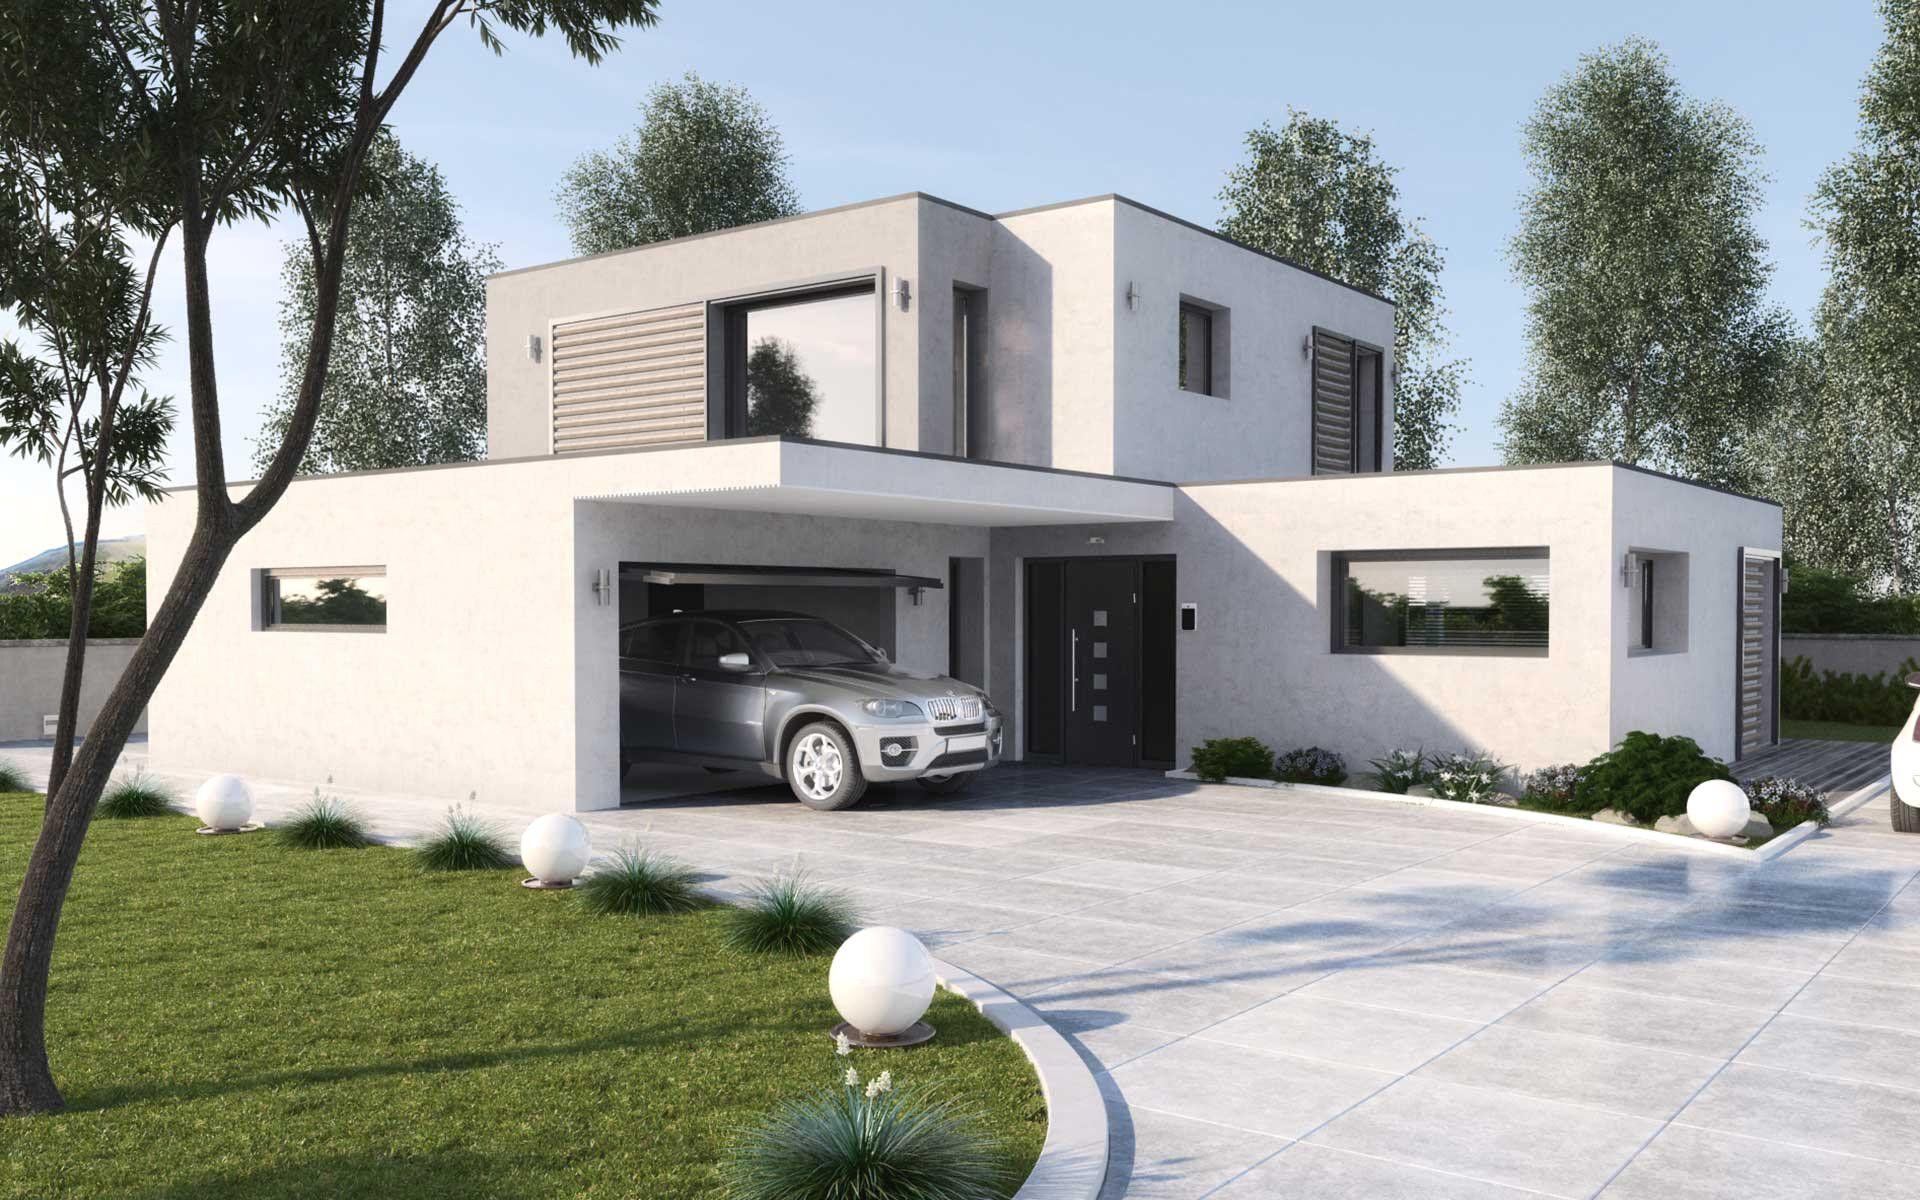 Idee maison sims 4 avec idee construction maison sims 4 avec sims 3 modern moderne house idees et idee construction maison sims 4 avec tarifs et prix